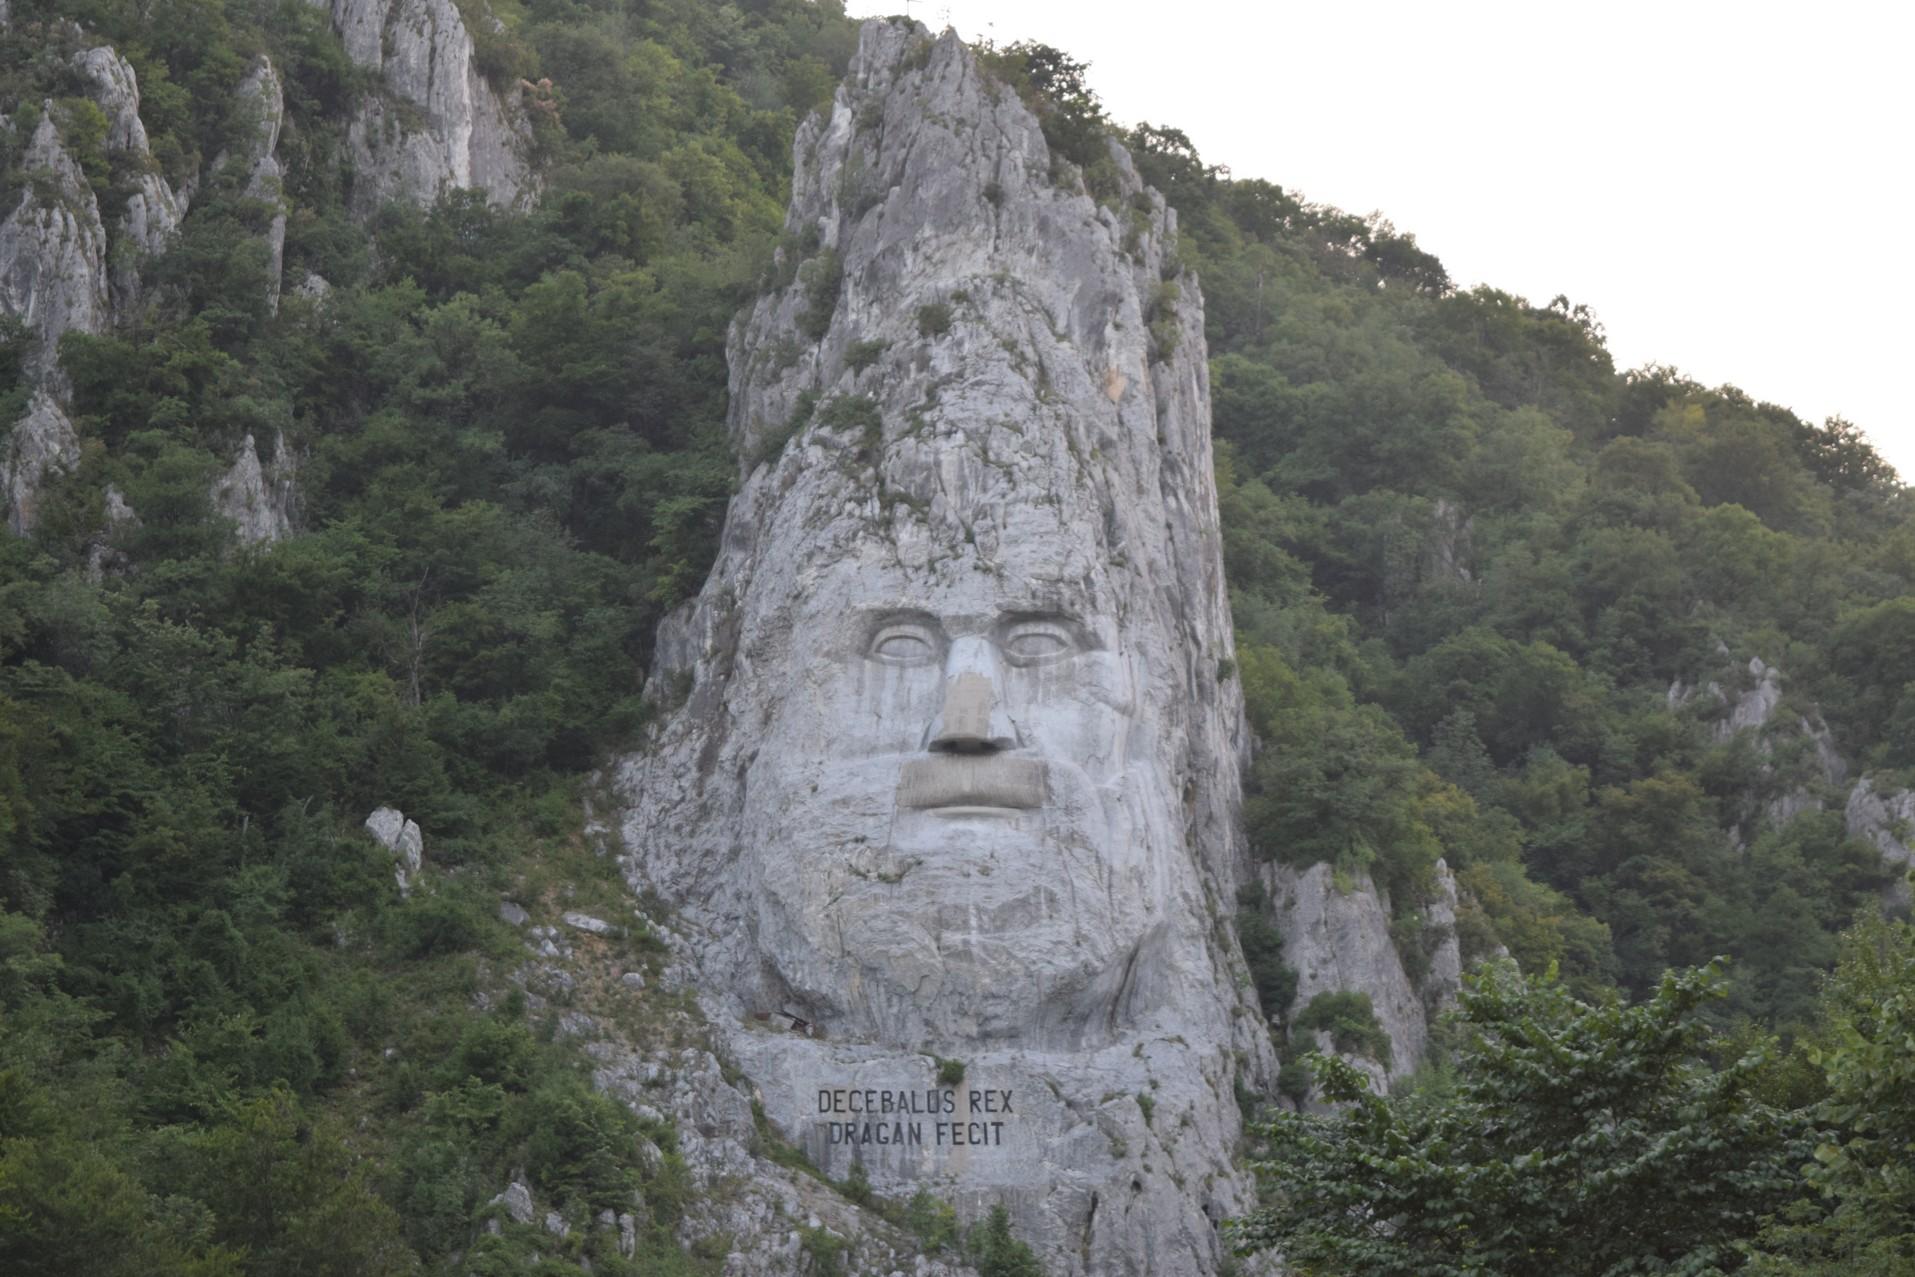 Decebal face